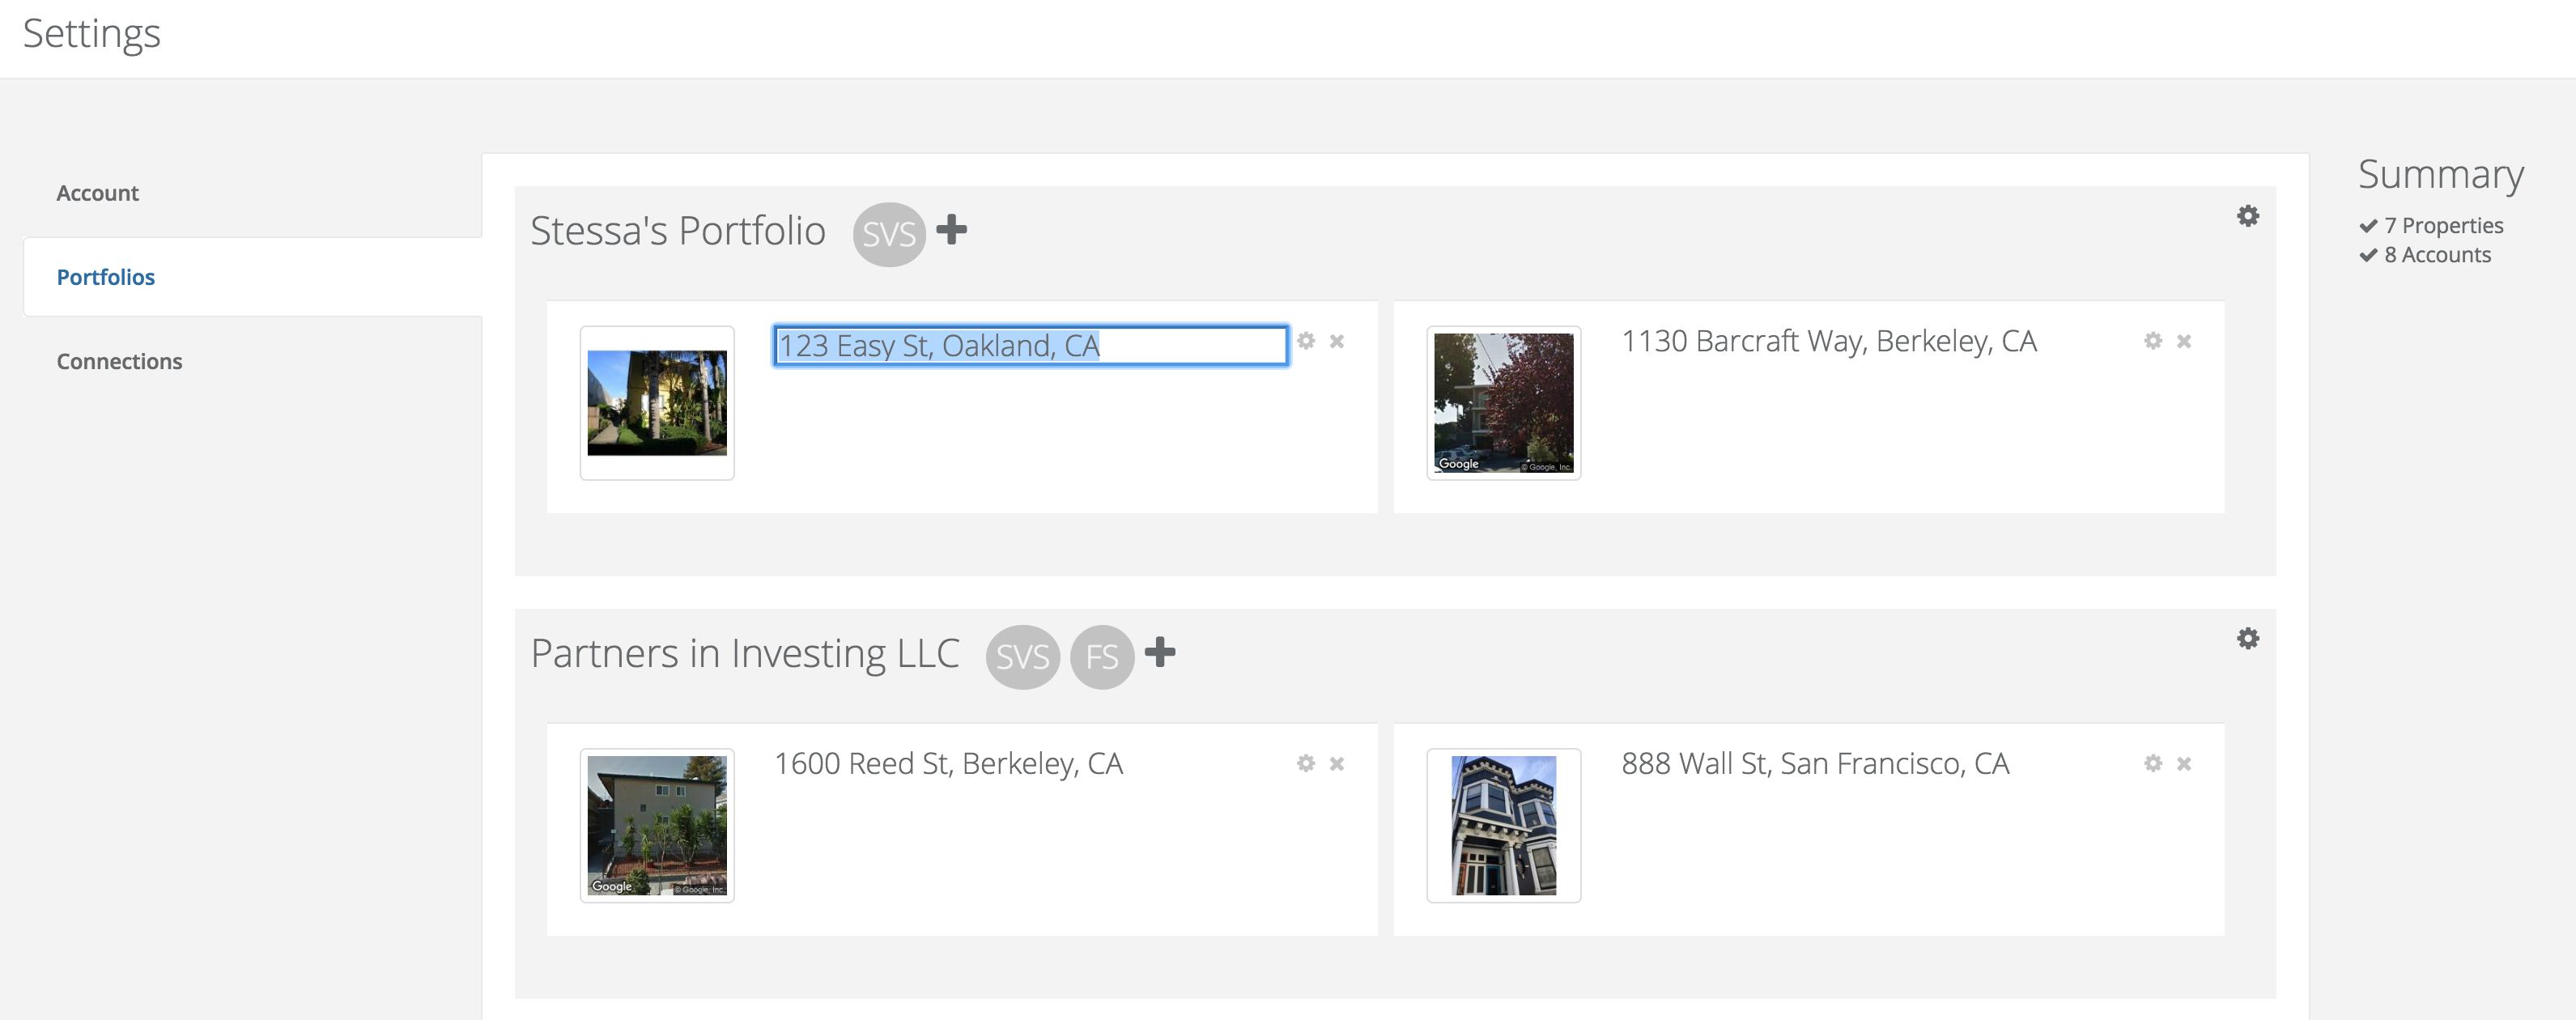 Update property addresses, names, and edit portfolios